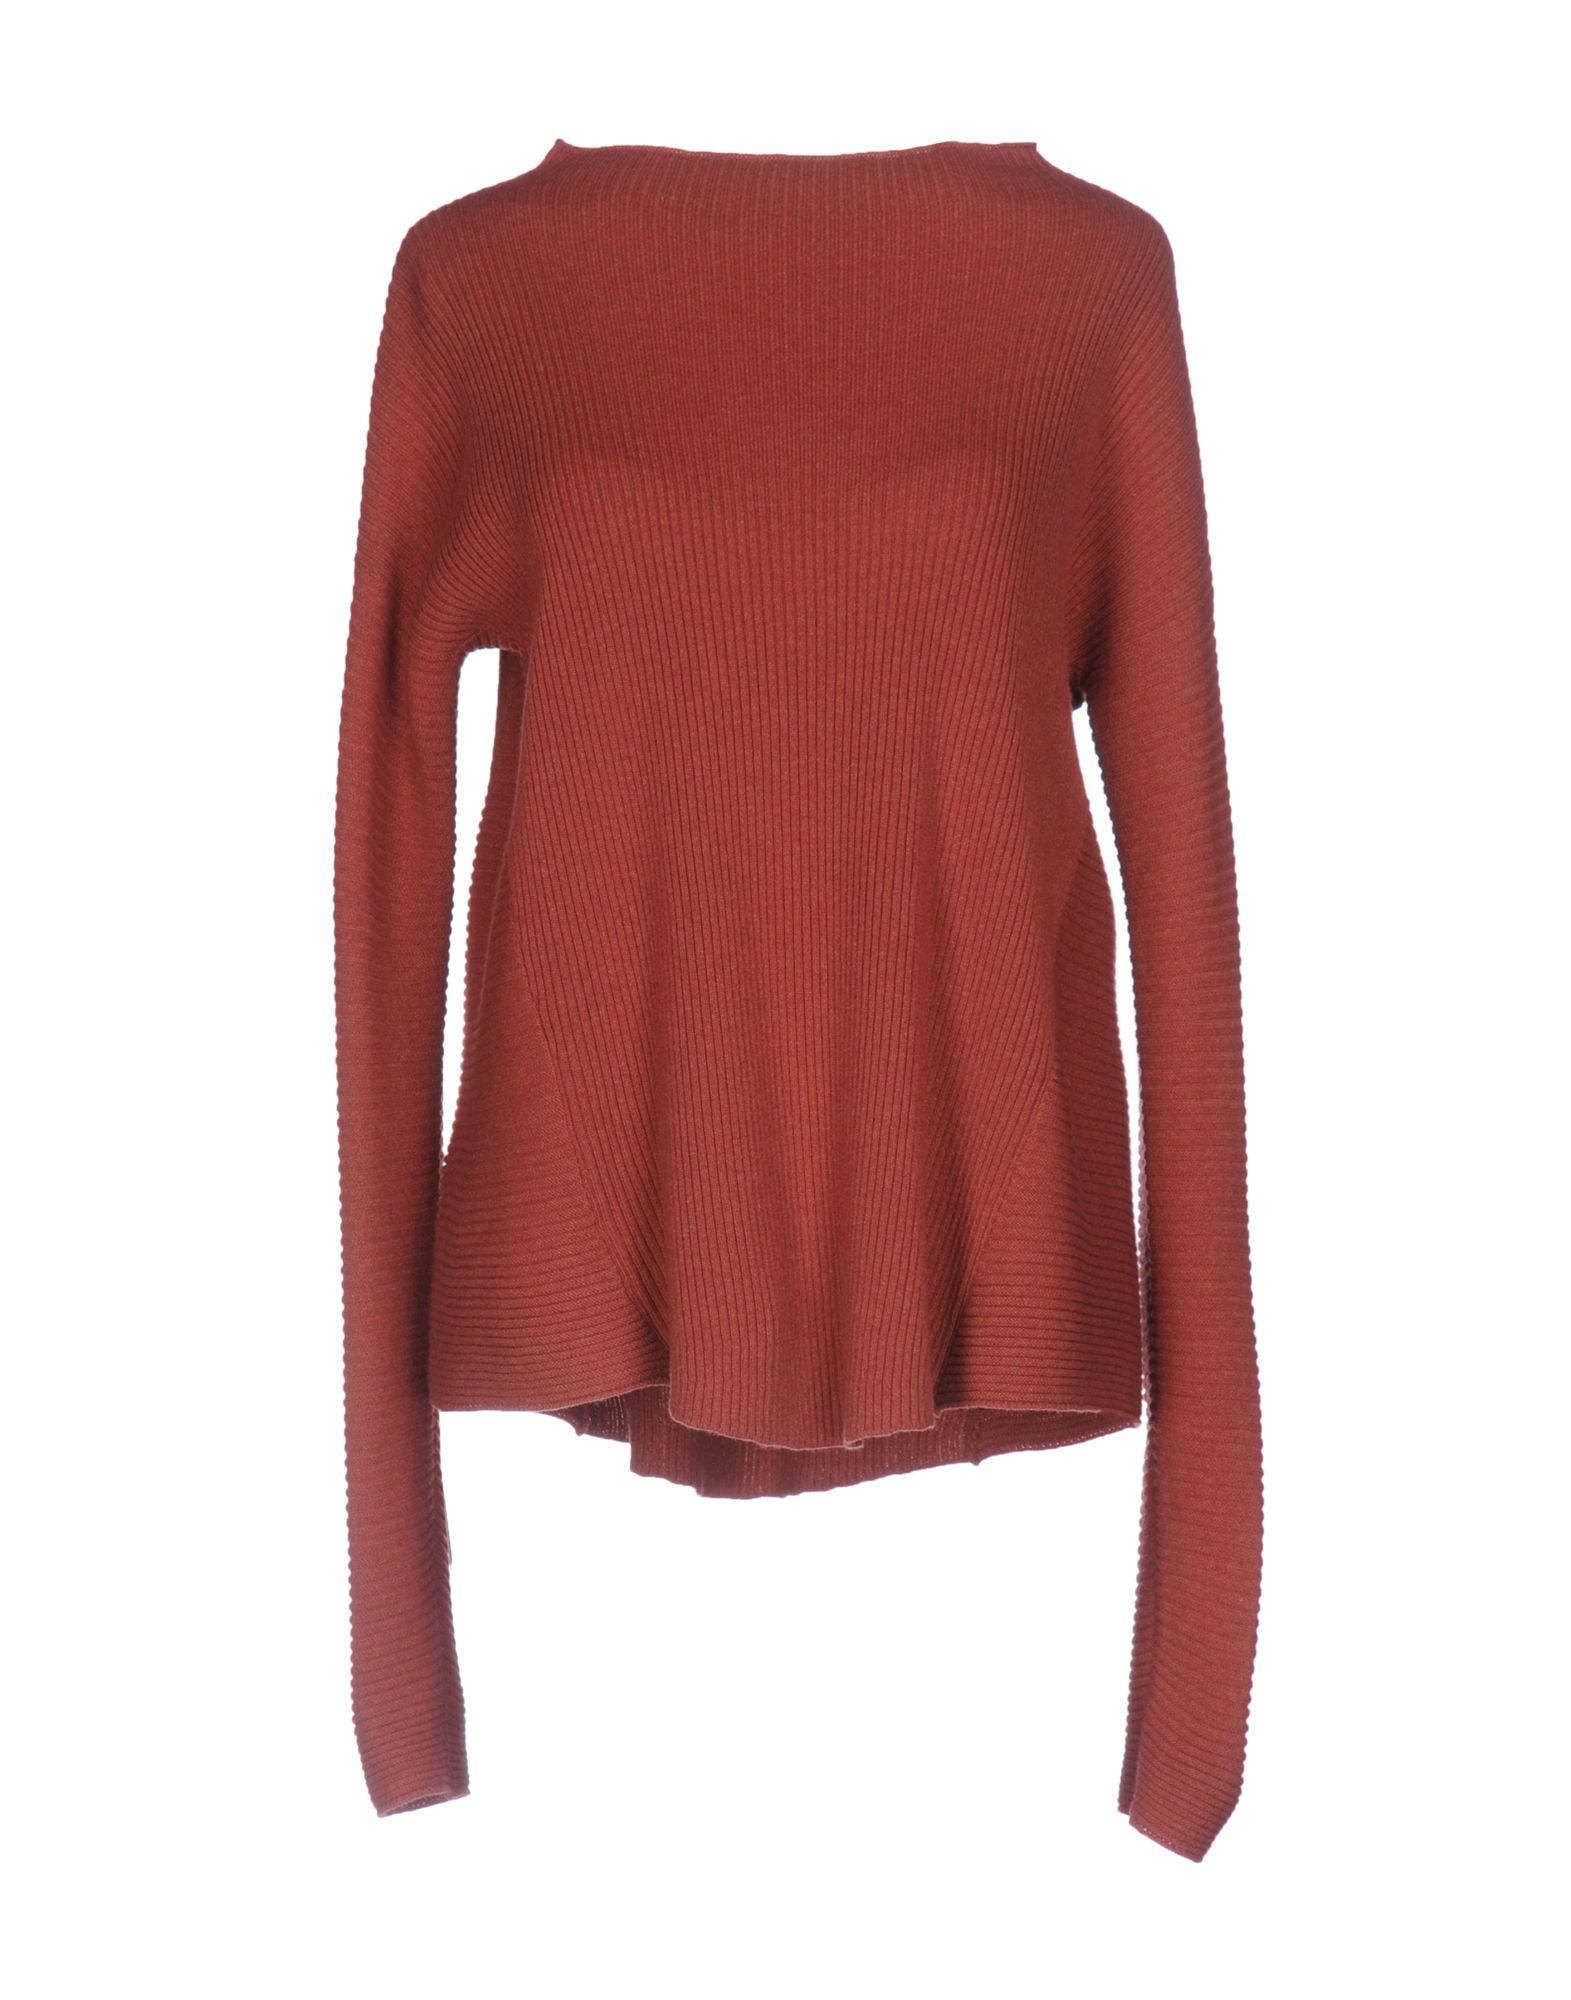 TORTONA 21 Damen Pullover Farbe Altrosa Größe 6 - broschei